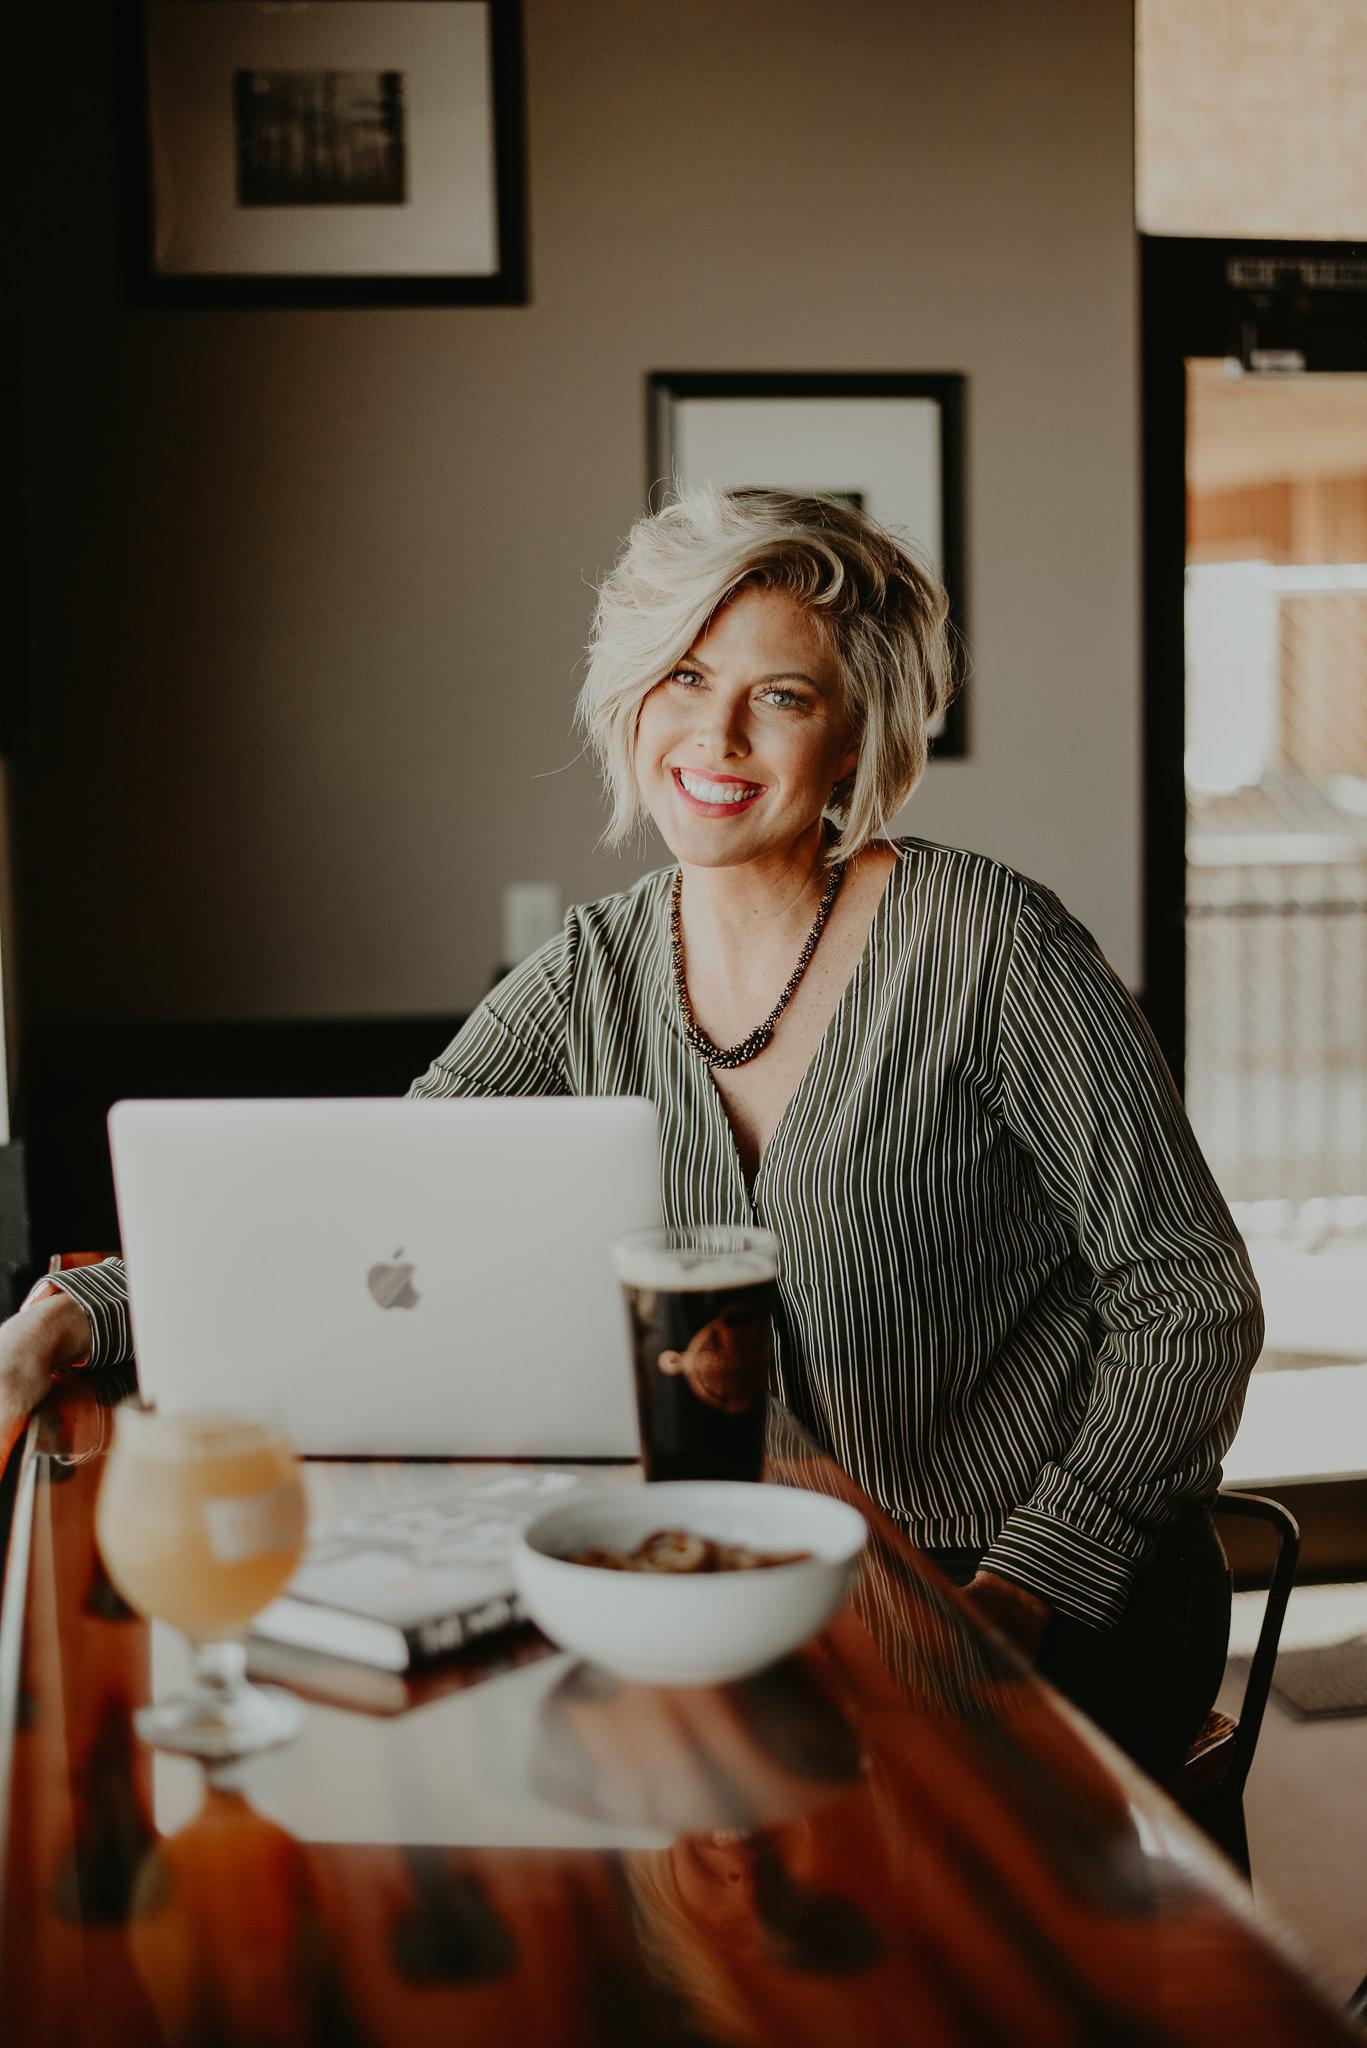 Mary Taylor | Owner | Editor | Publisher    EMAIL | tayloredlivingmagazine@gmail.com    PHOTO CREDIT | TAYLOR ALTON | @TAYLORALTONPHOTOGRAPHY